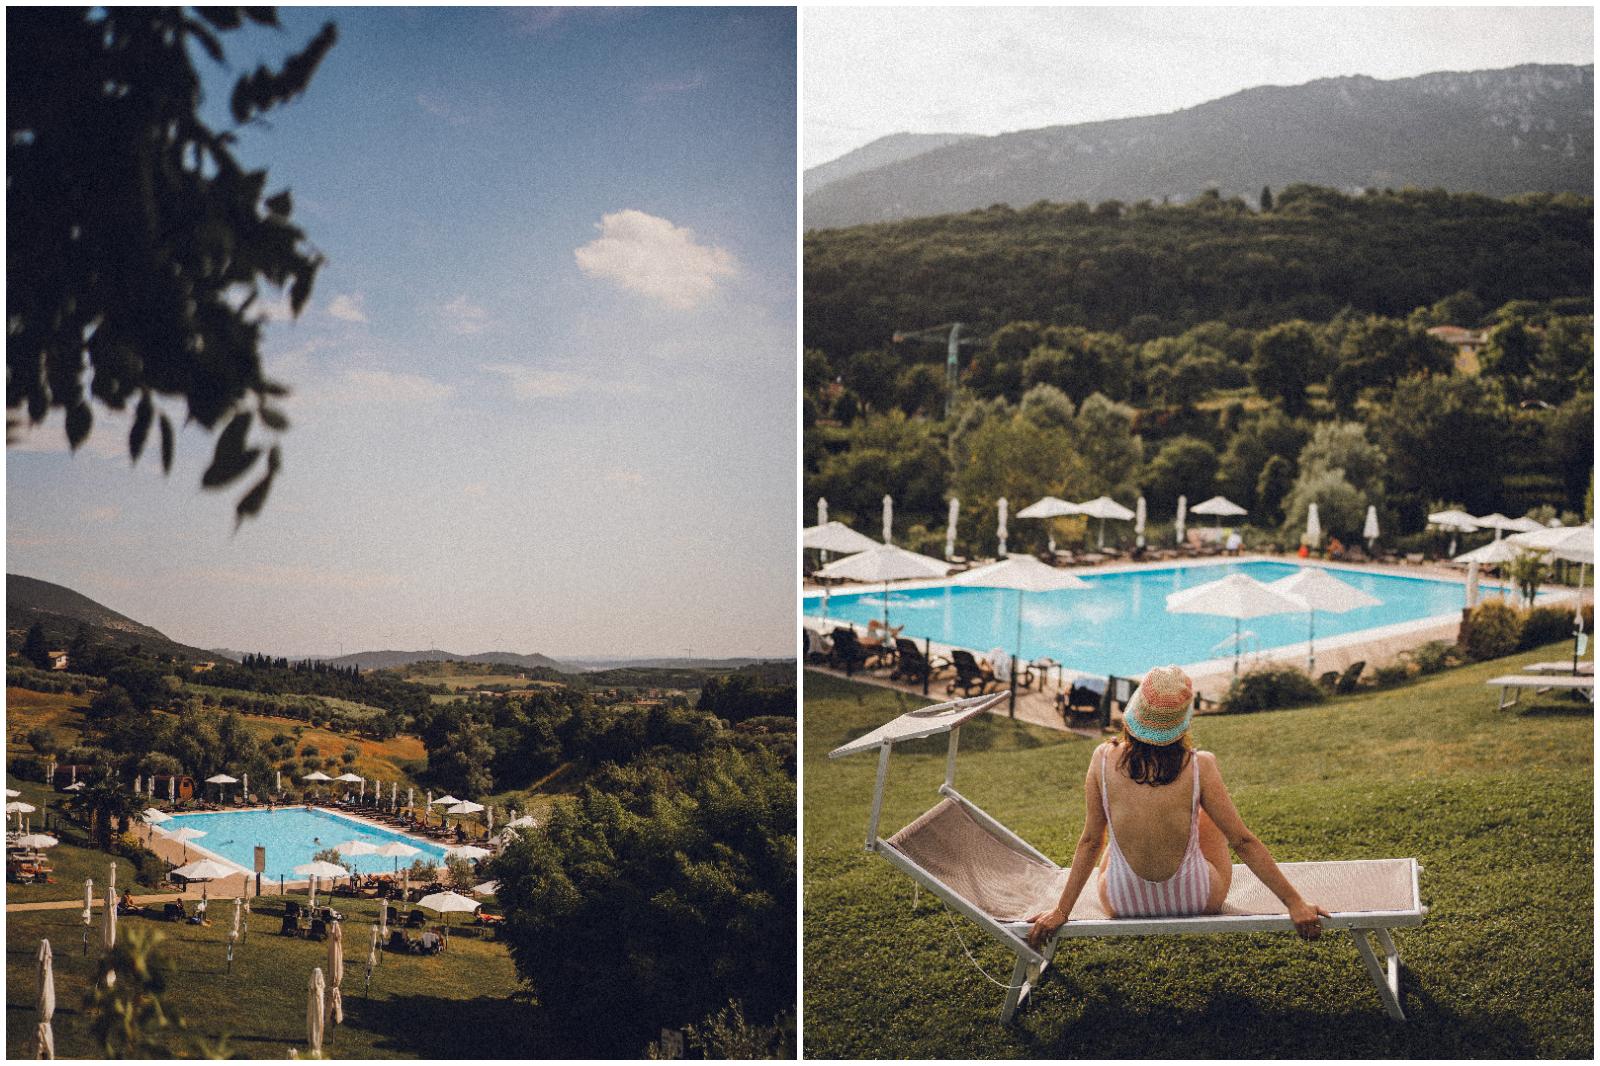 La piscina Villa Cariola